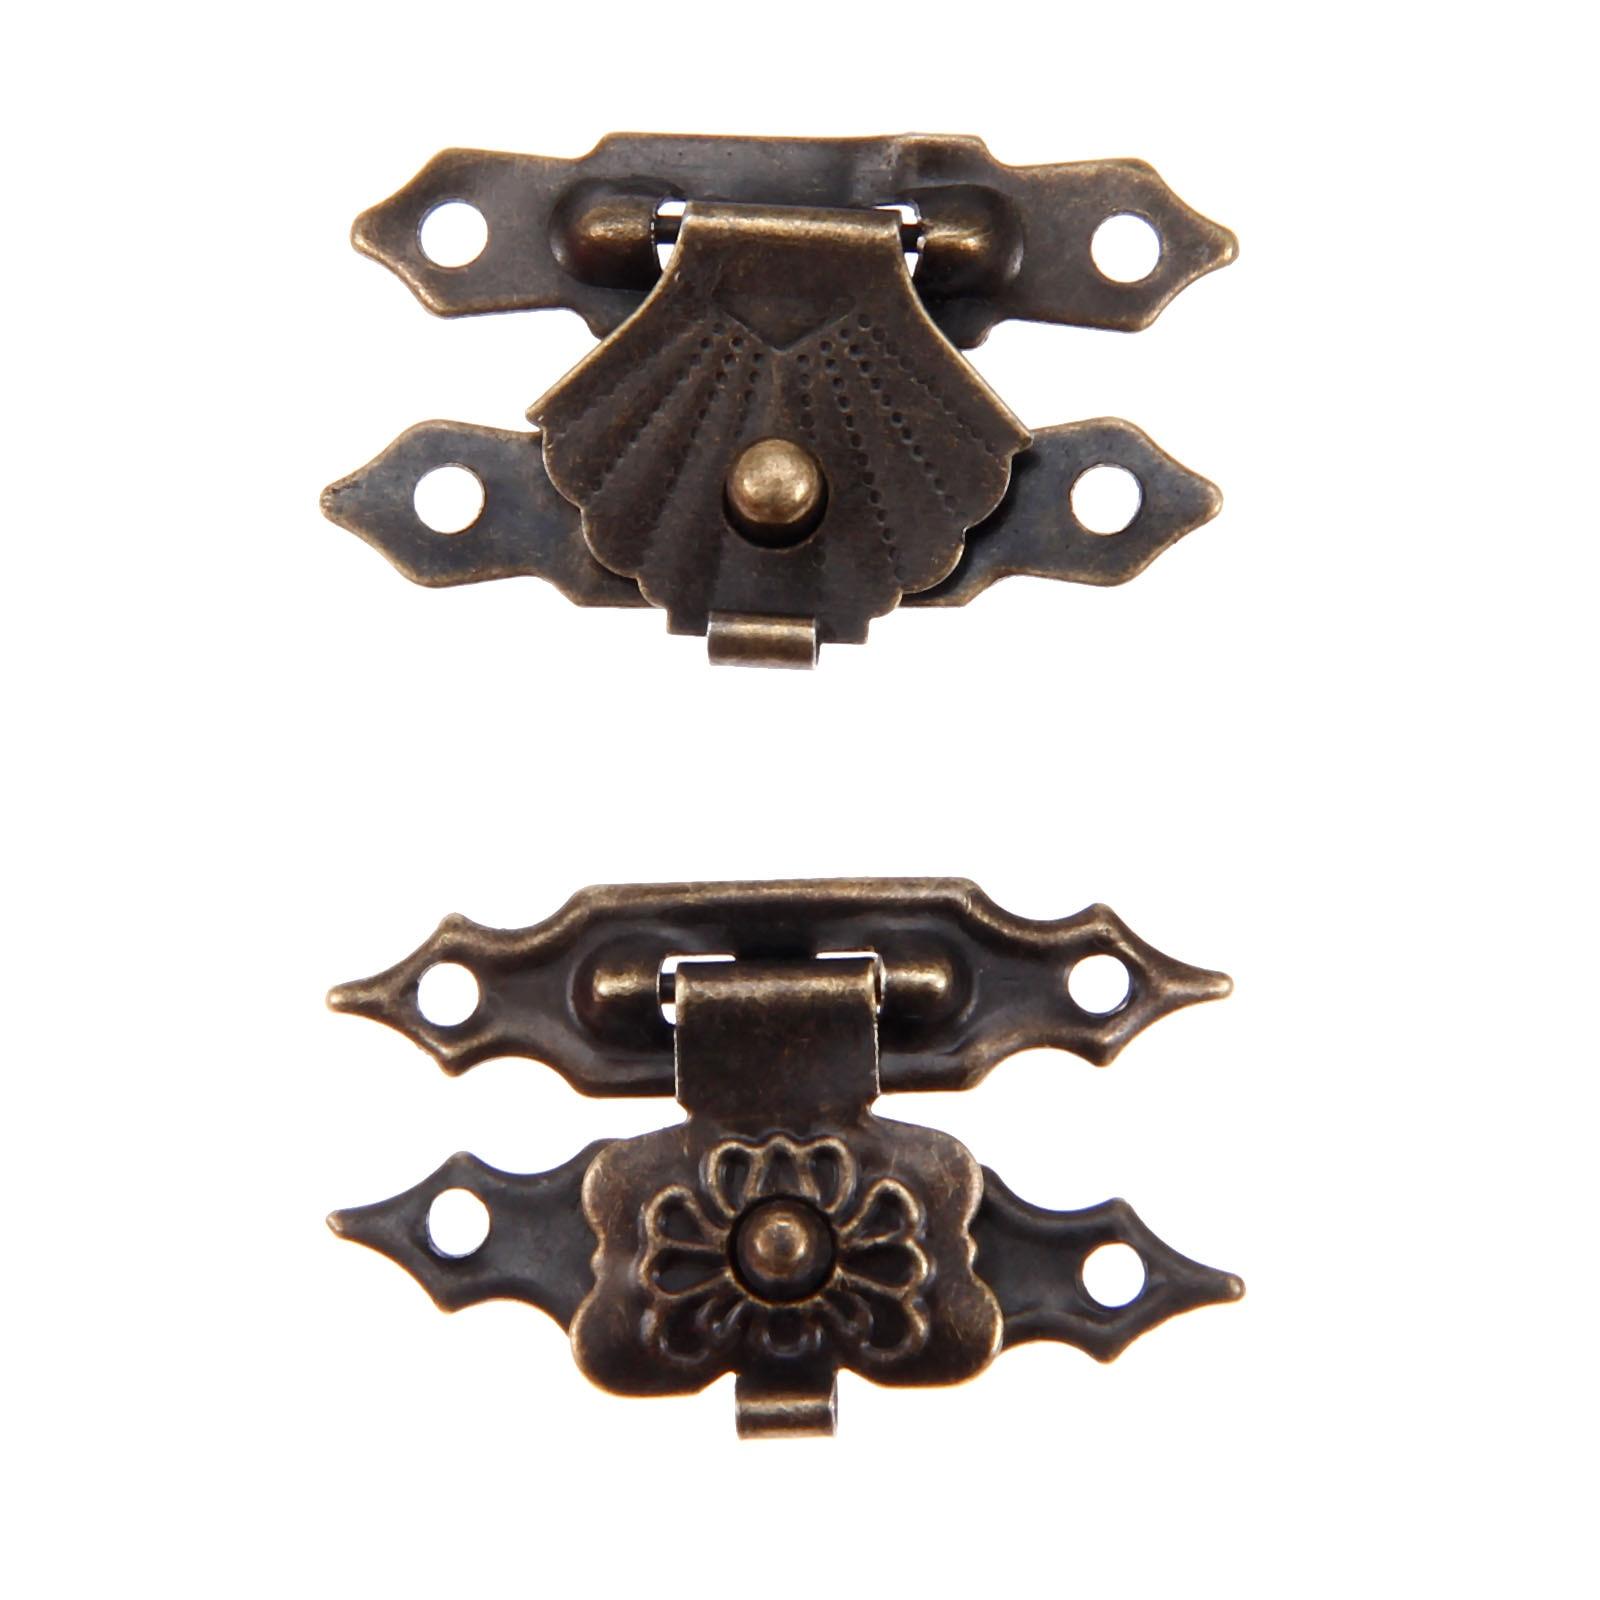 10Pcs Box Latch Hasps Antique Iron Jewelry Padlock Hasp Locked Wooden Wine Gift Box Handbag Buckle Hardware Accessories 30x18mm